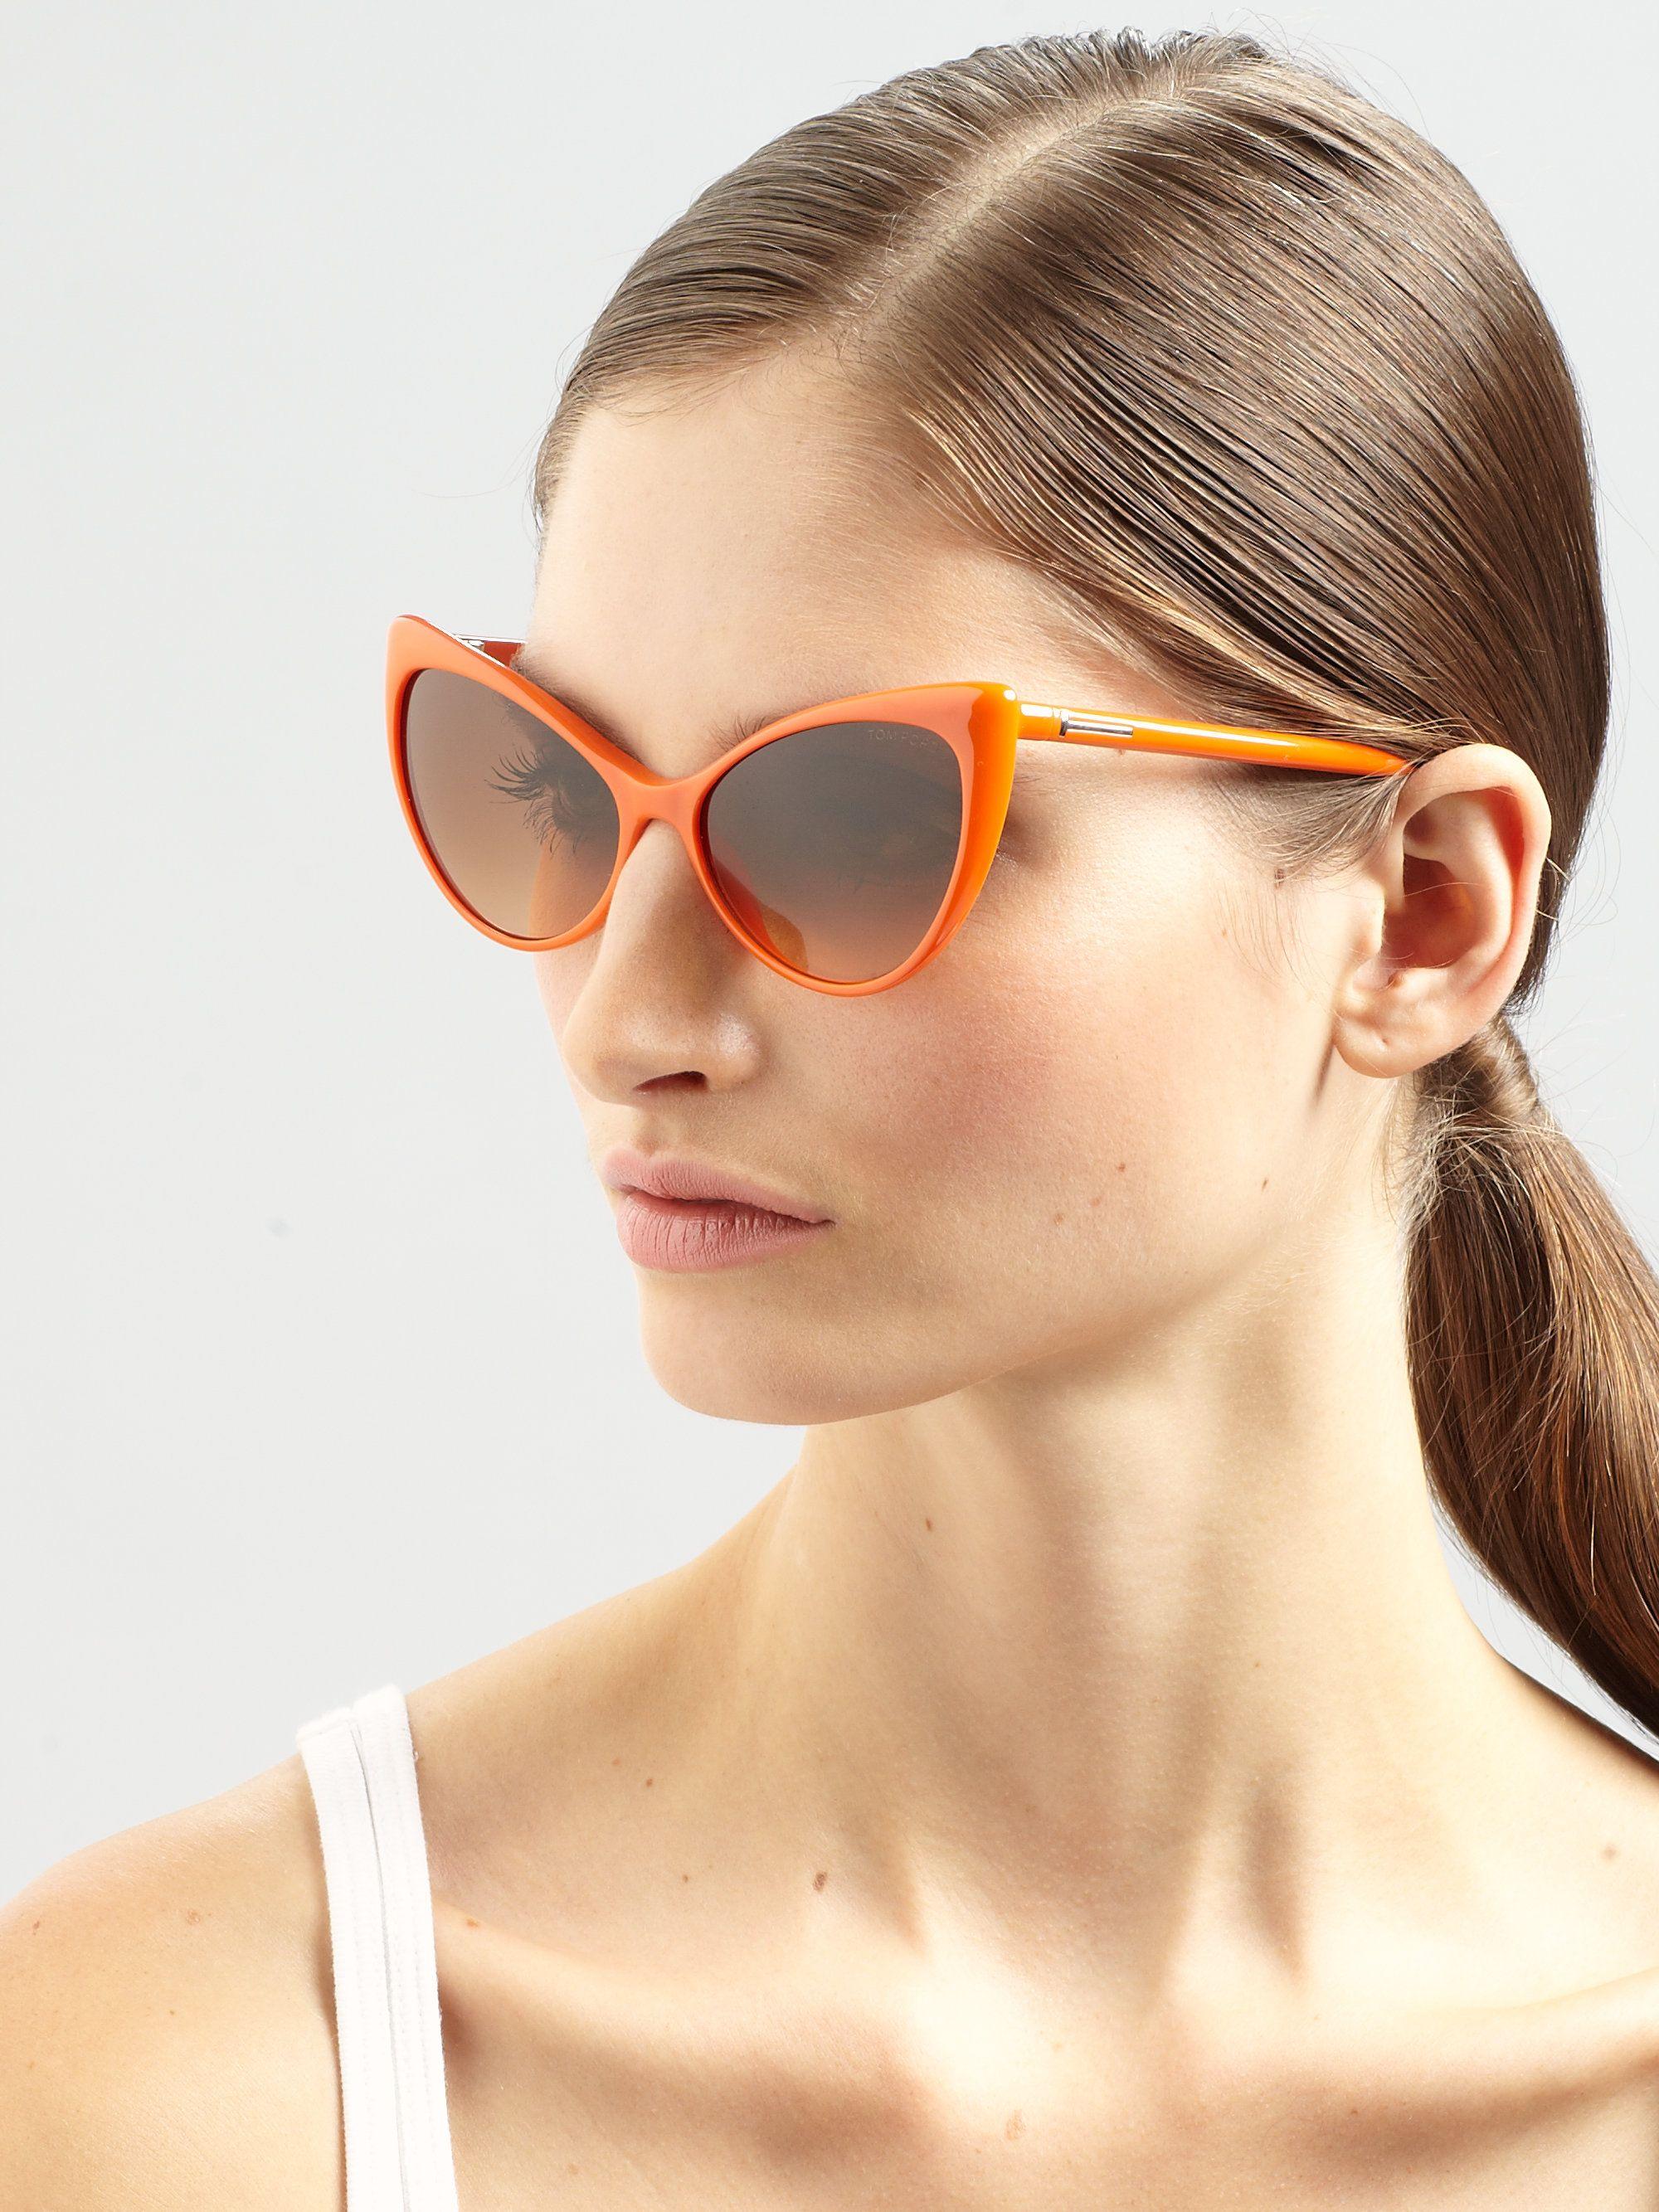 d9547631aa6c  tom  ford  anastasia  sunglasses  cateyed  cateye  orange  designer   luxury  trendy  fashionable  summer  2017  2016  womens  fashion  cute   women